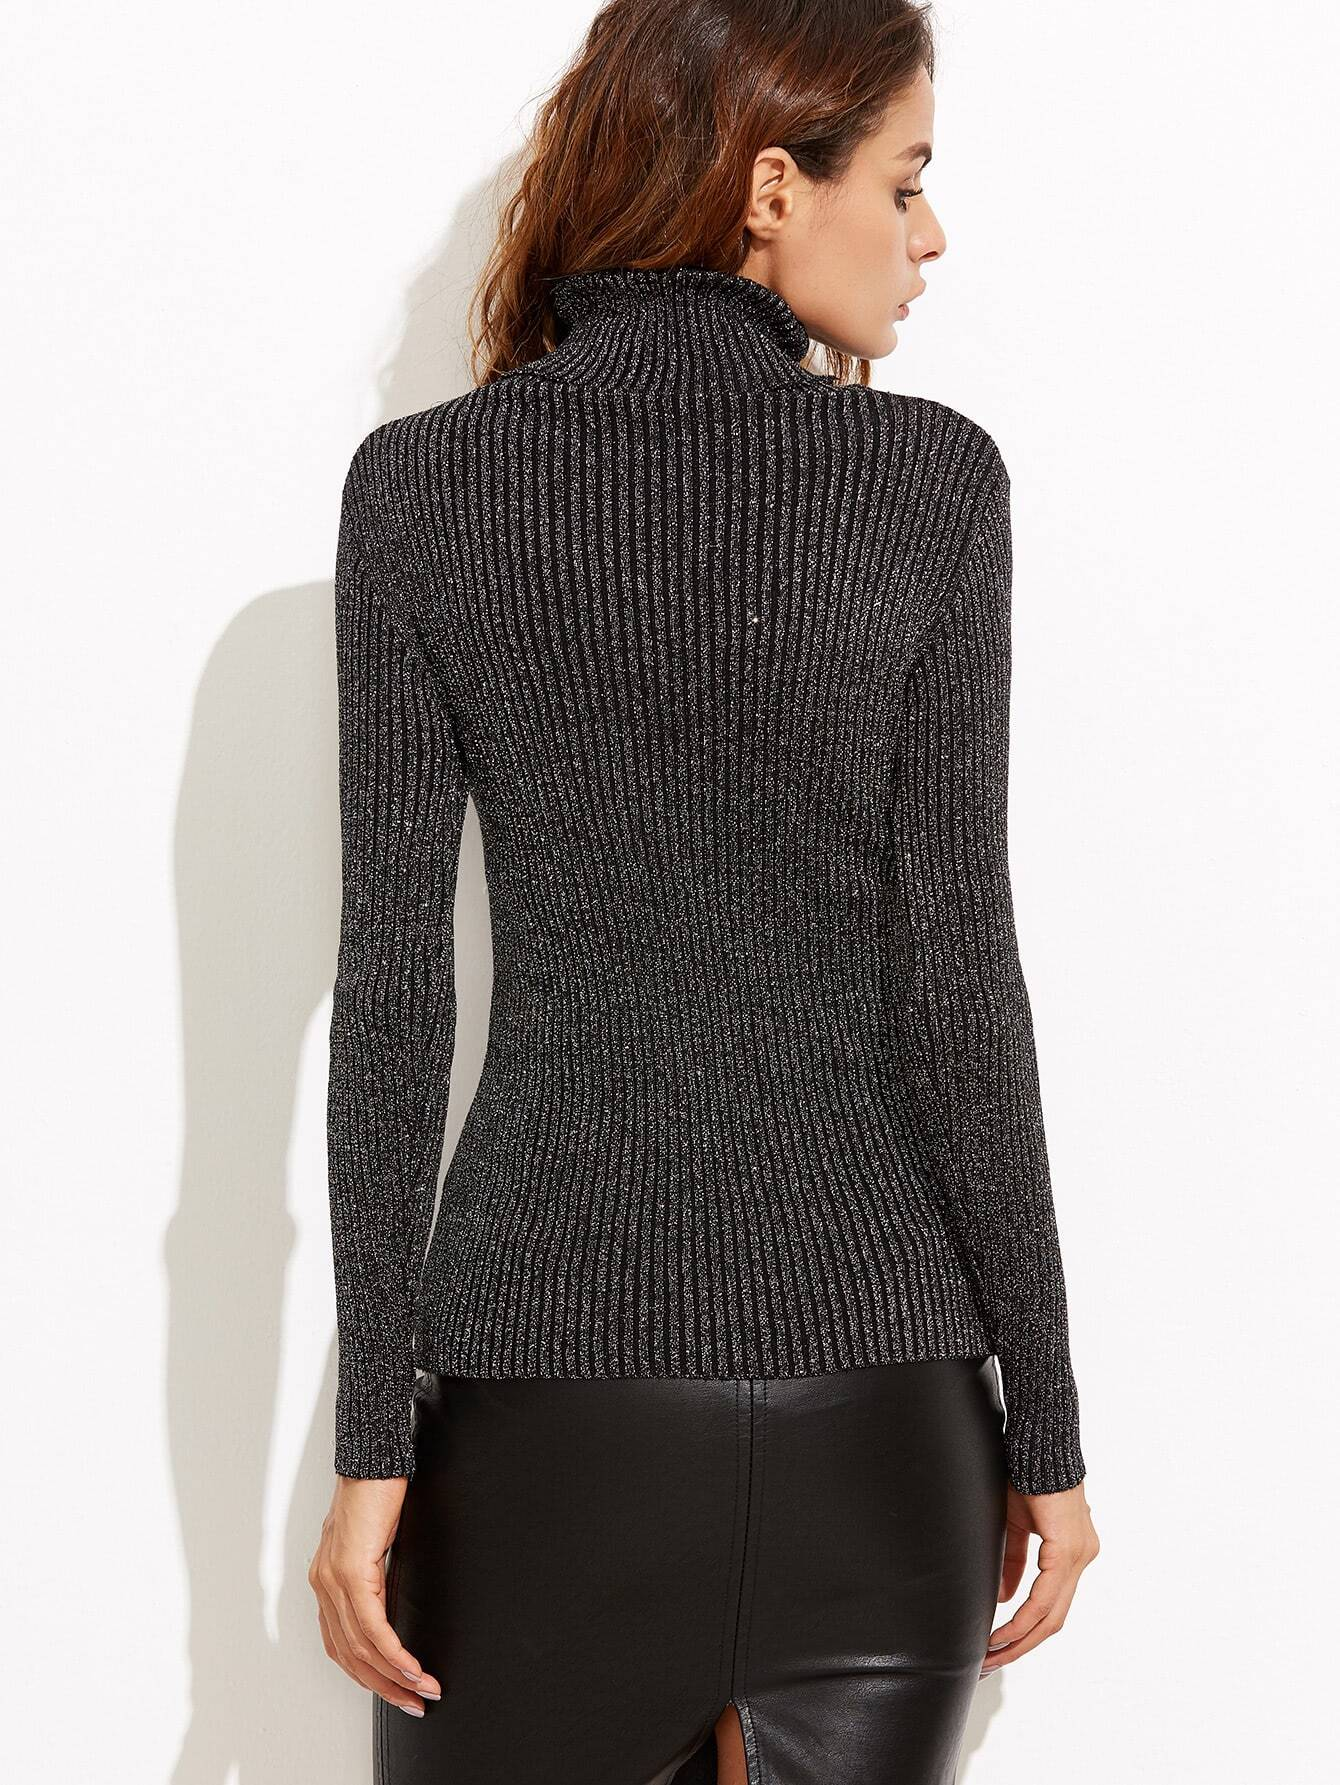 sweater160919001_2